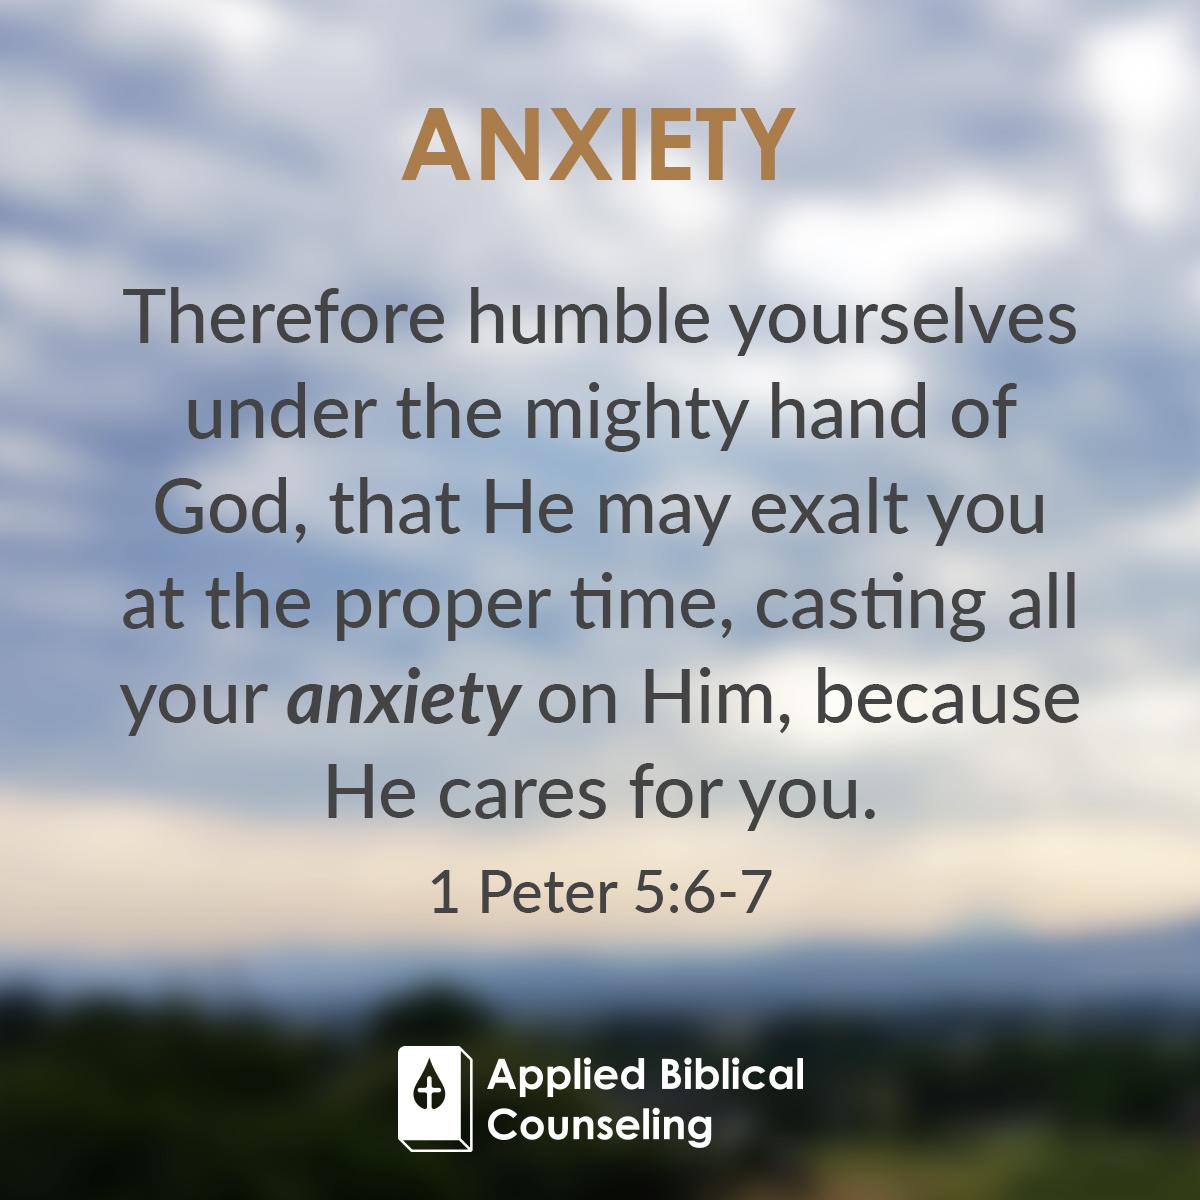 ABC_Facebook-w8-anxiety-3